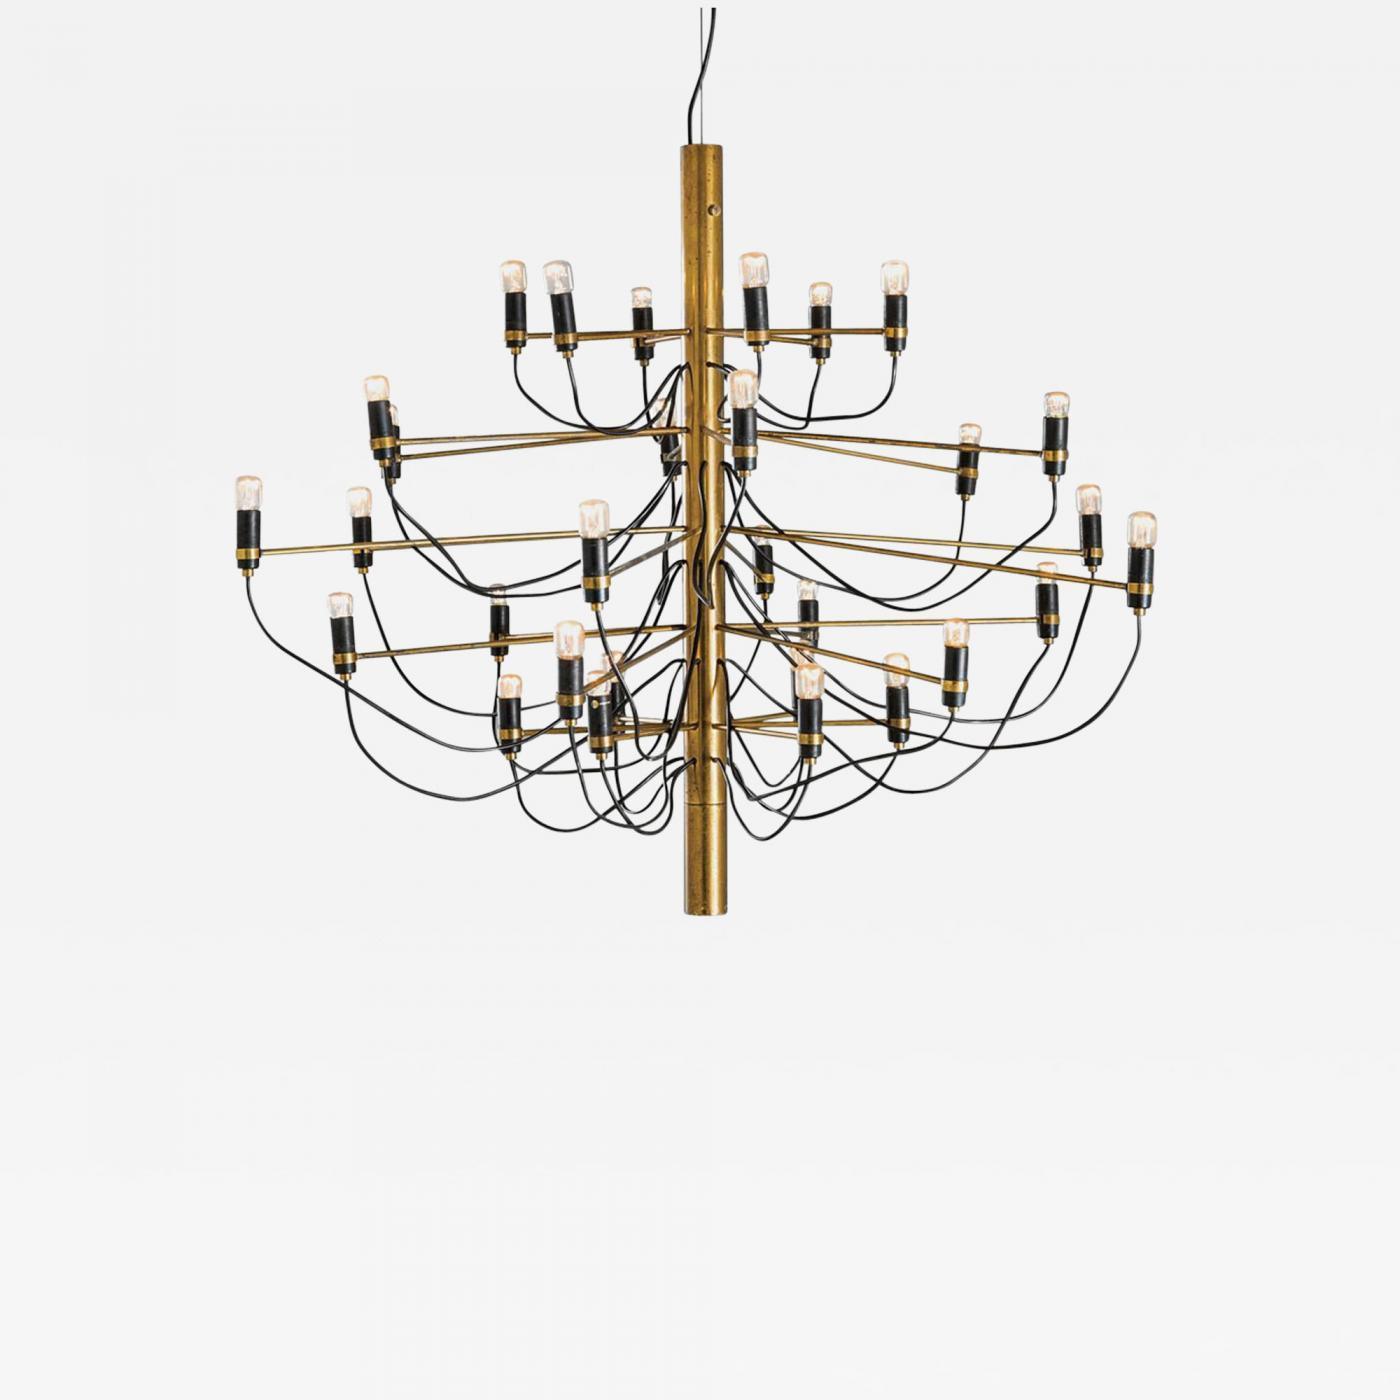 Listings Furniture Lighting Chandeliers And Pendants Gino Sarfatti Chandelier 2097